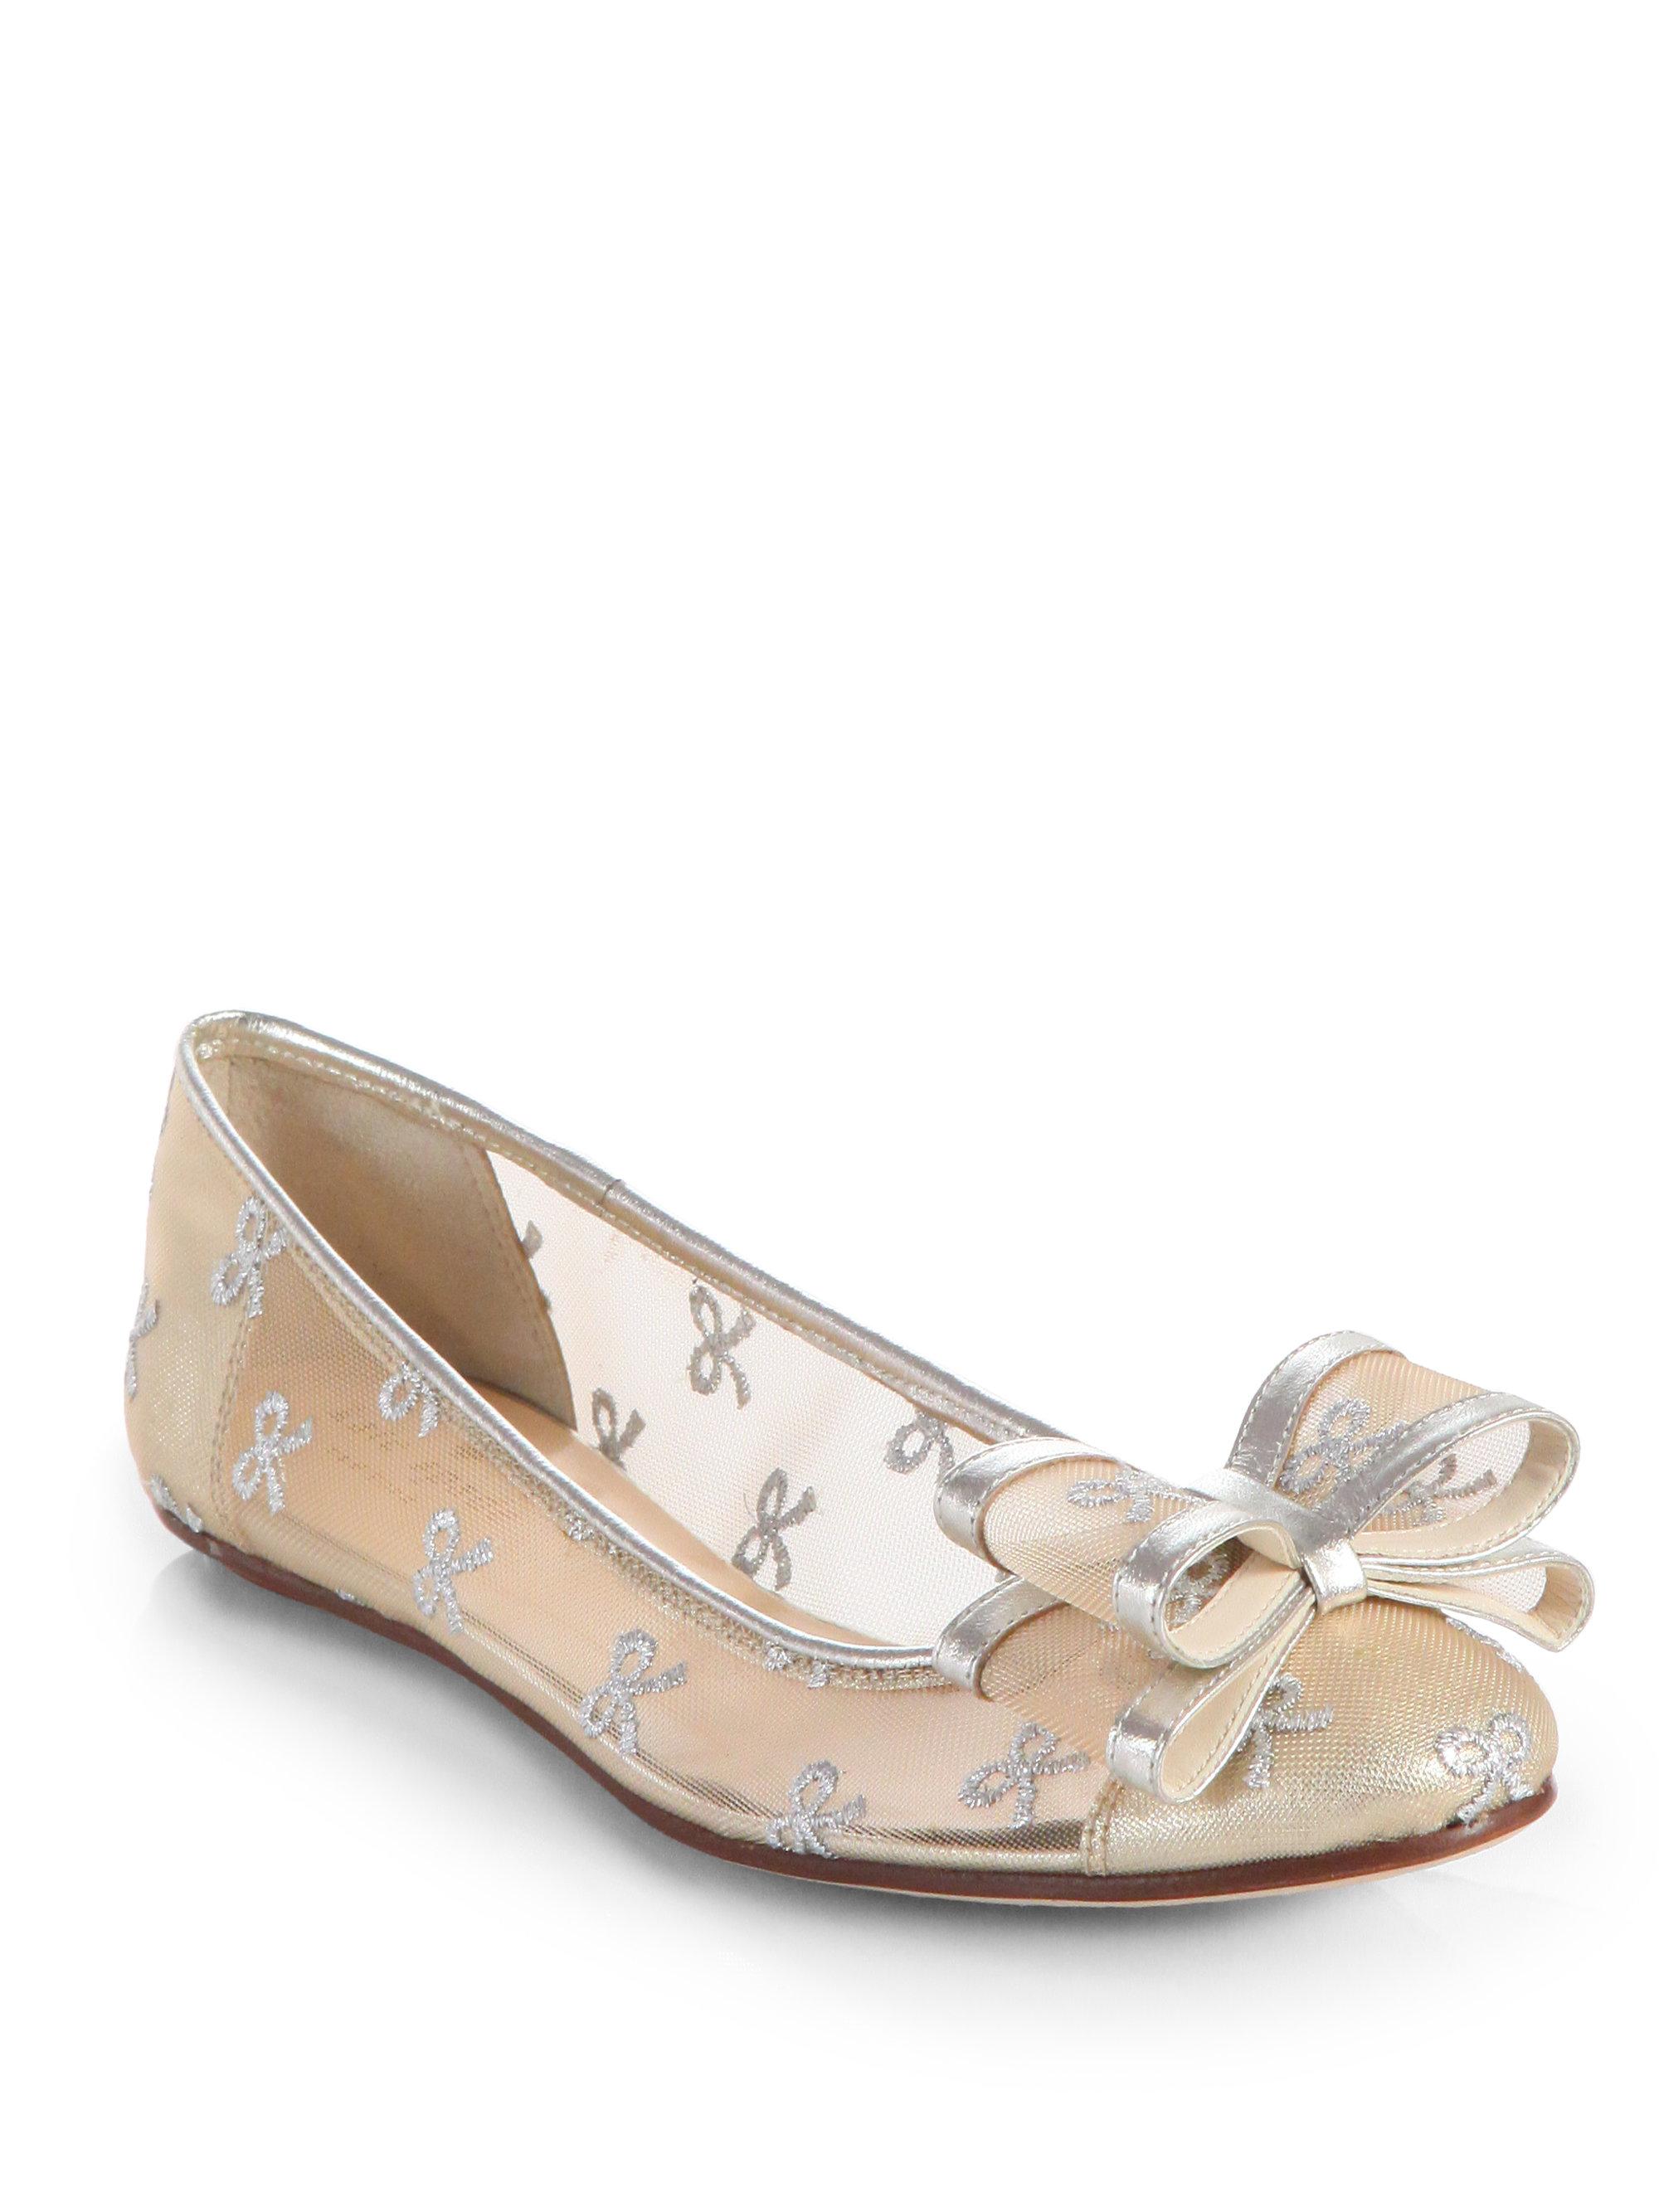 a307de843 Kate Spade Bernice Mesh Leather Bow Ballet Flats in Metallic - Lyst